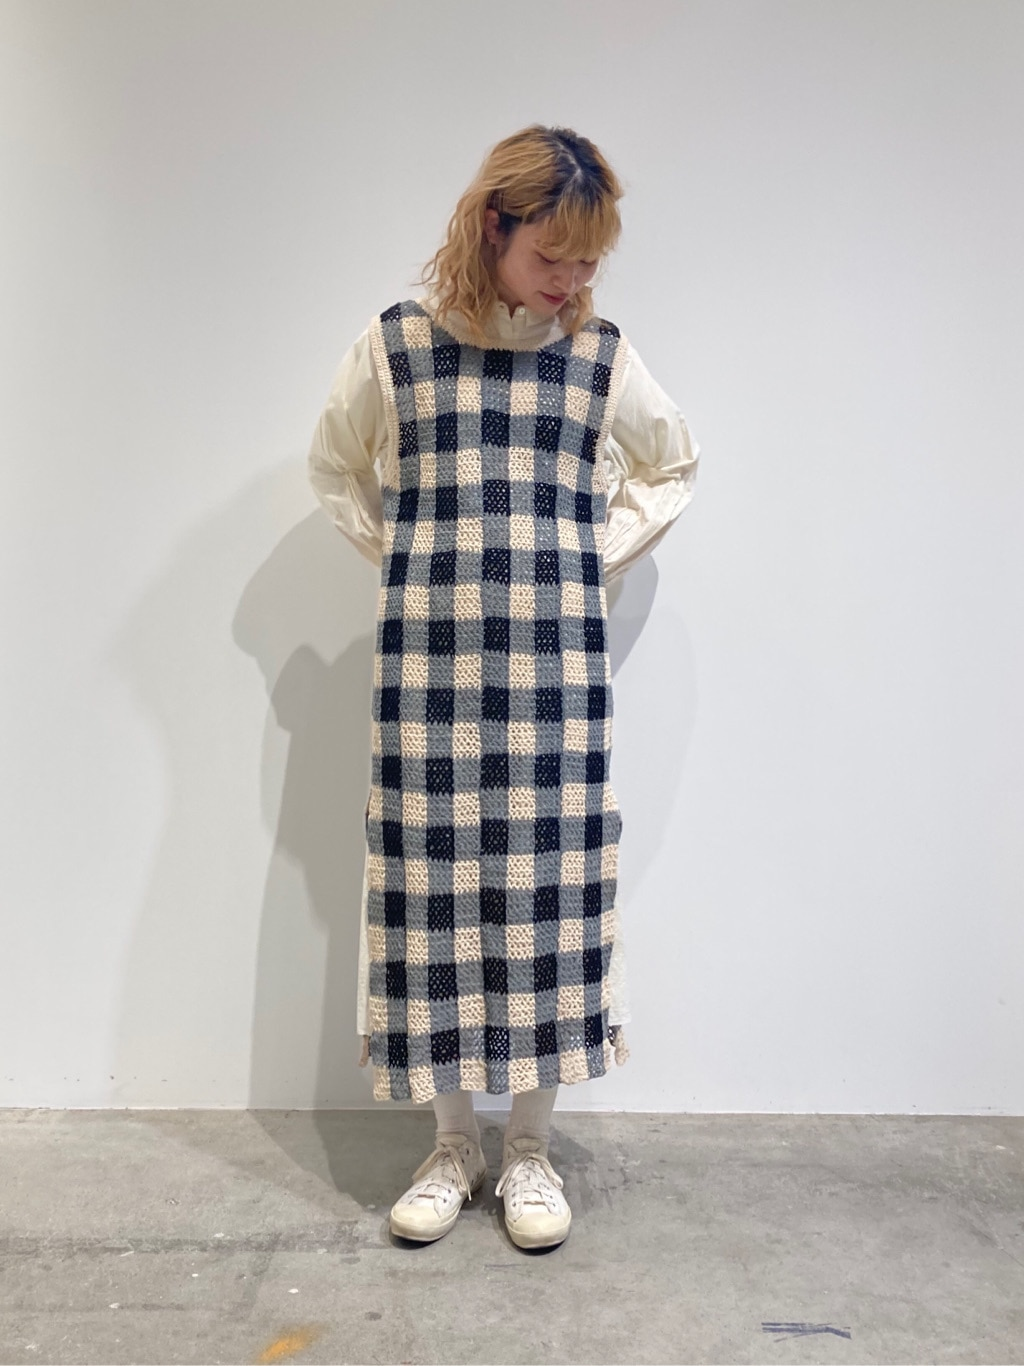 FLAT AMB 名古屋栄路面 2021.04.01